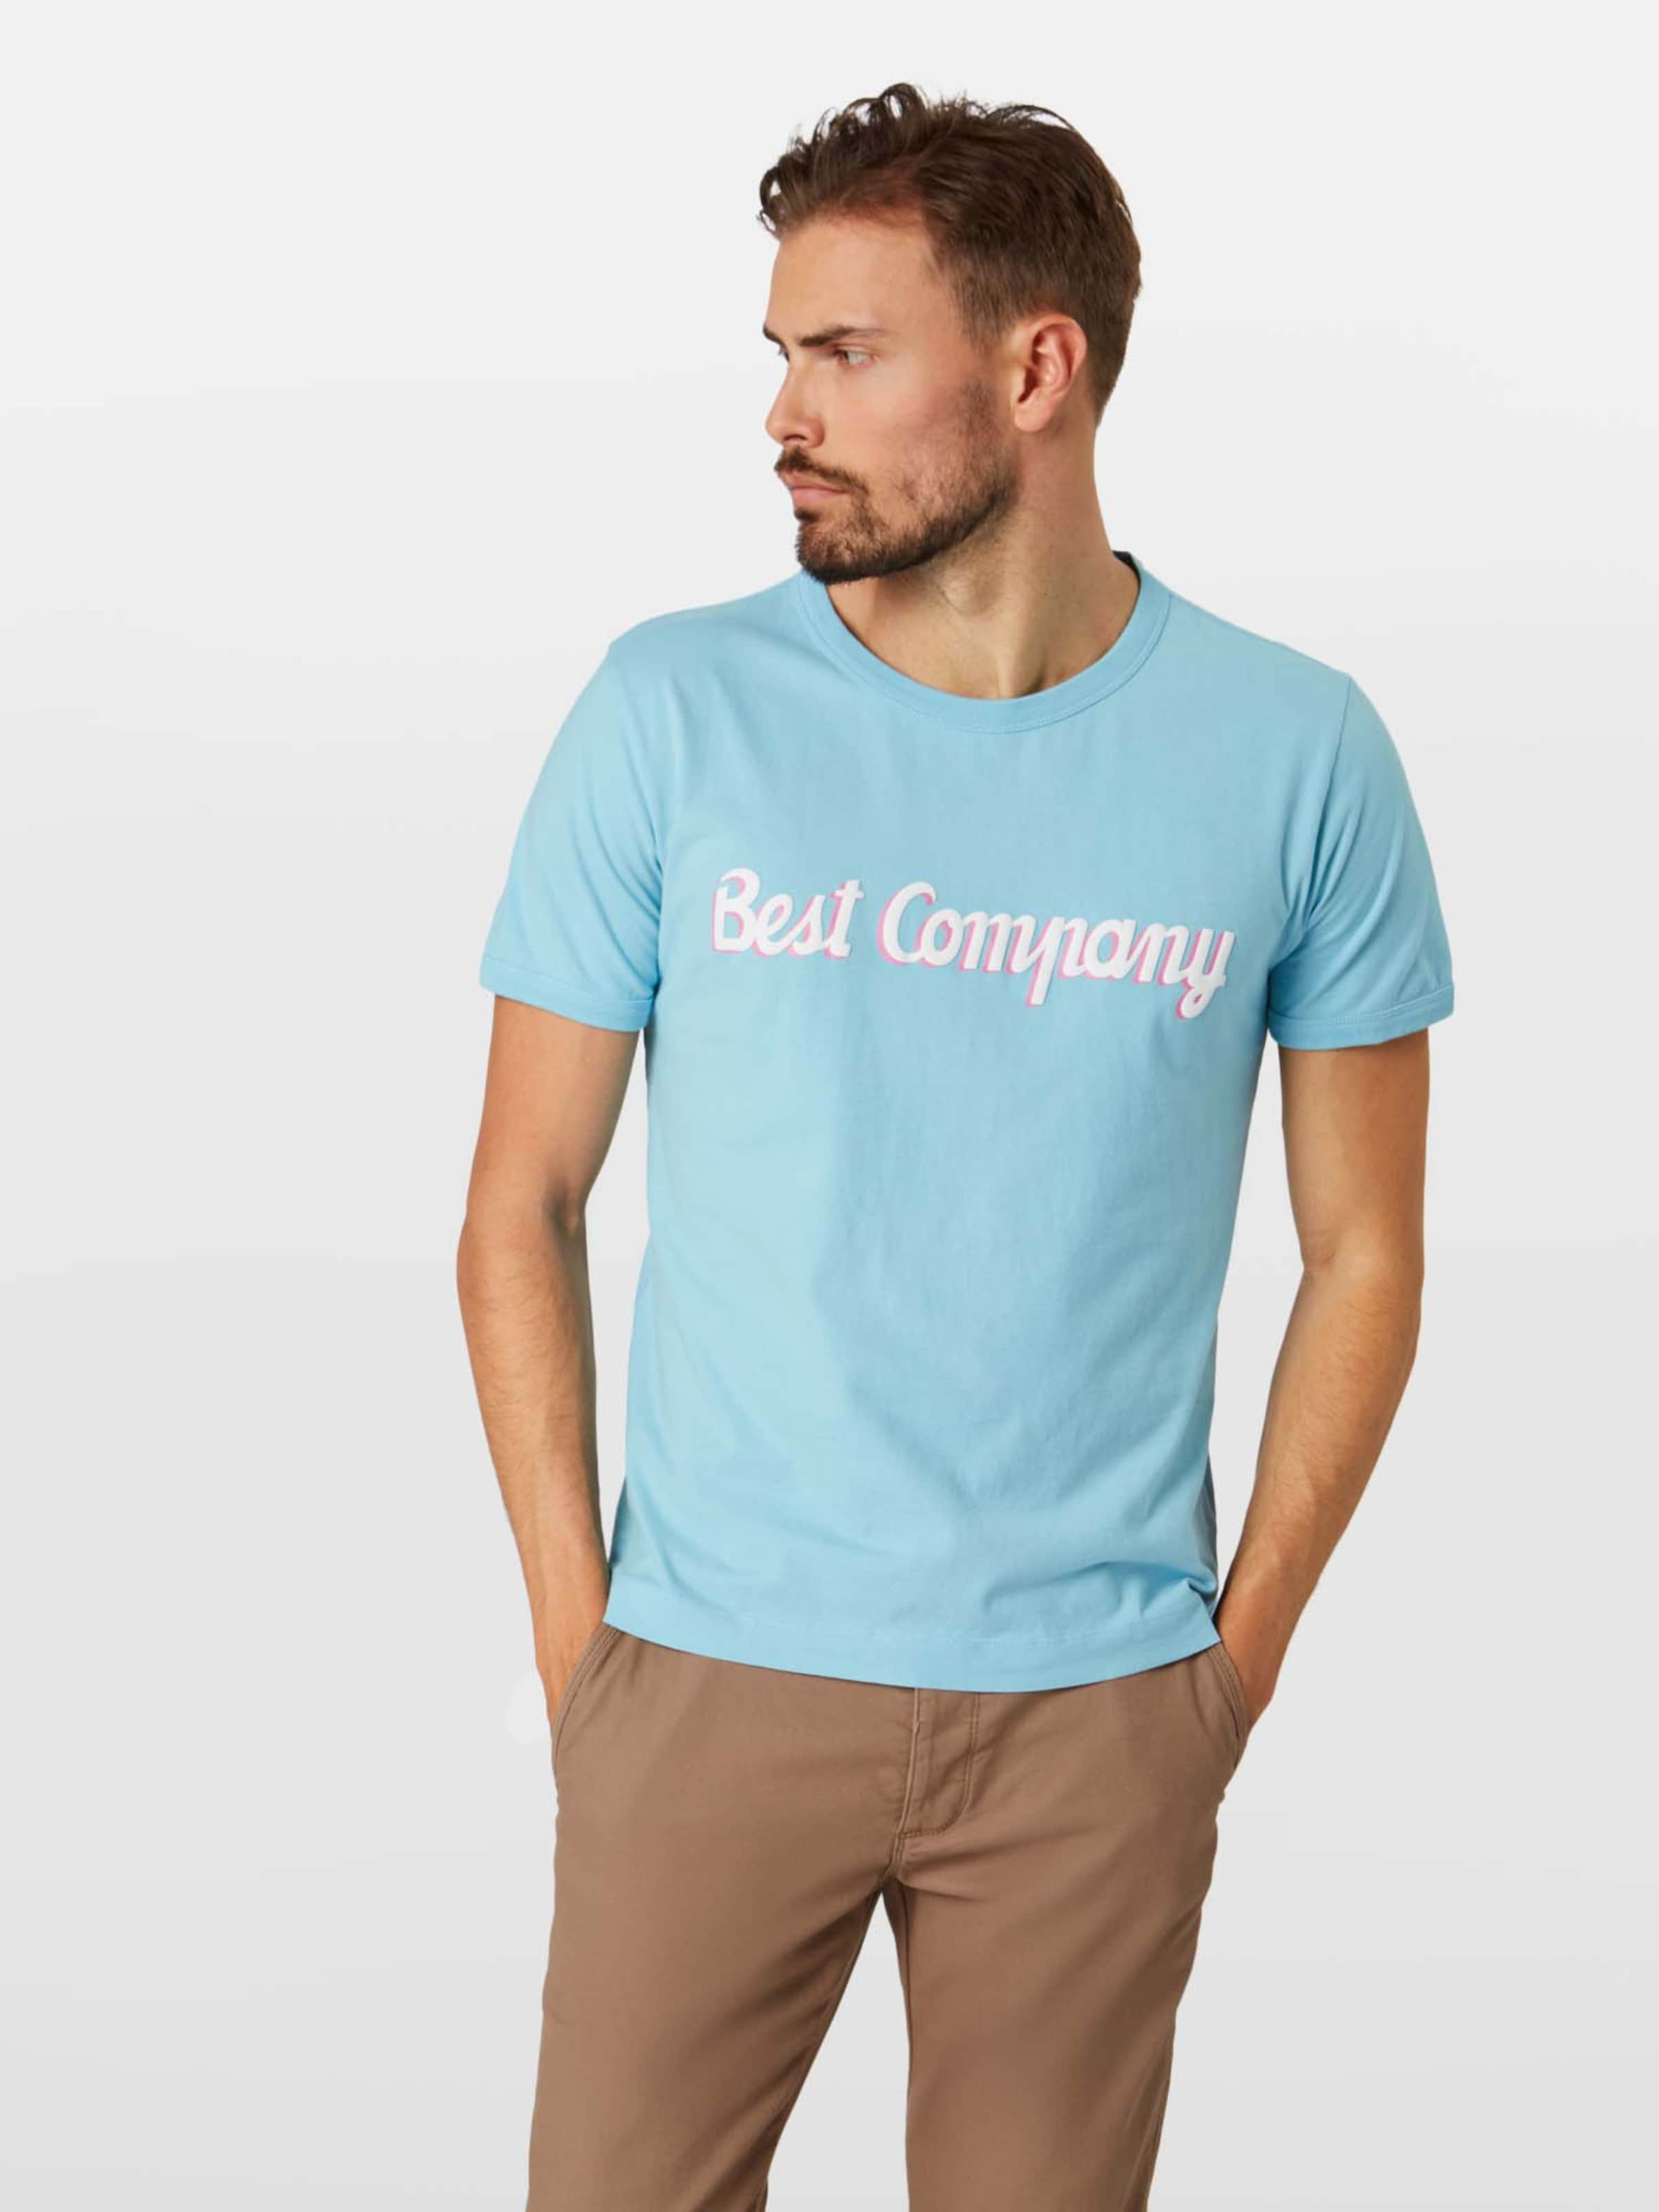 Rose T shirt Best En Company 29ebWHIDEY